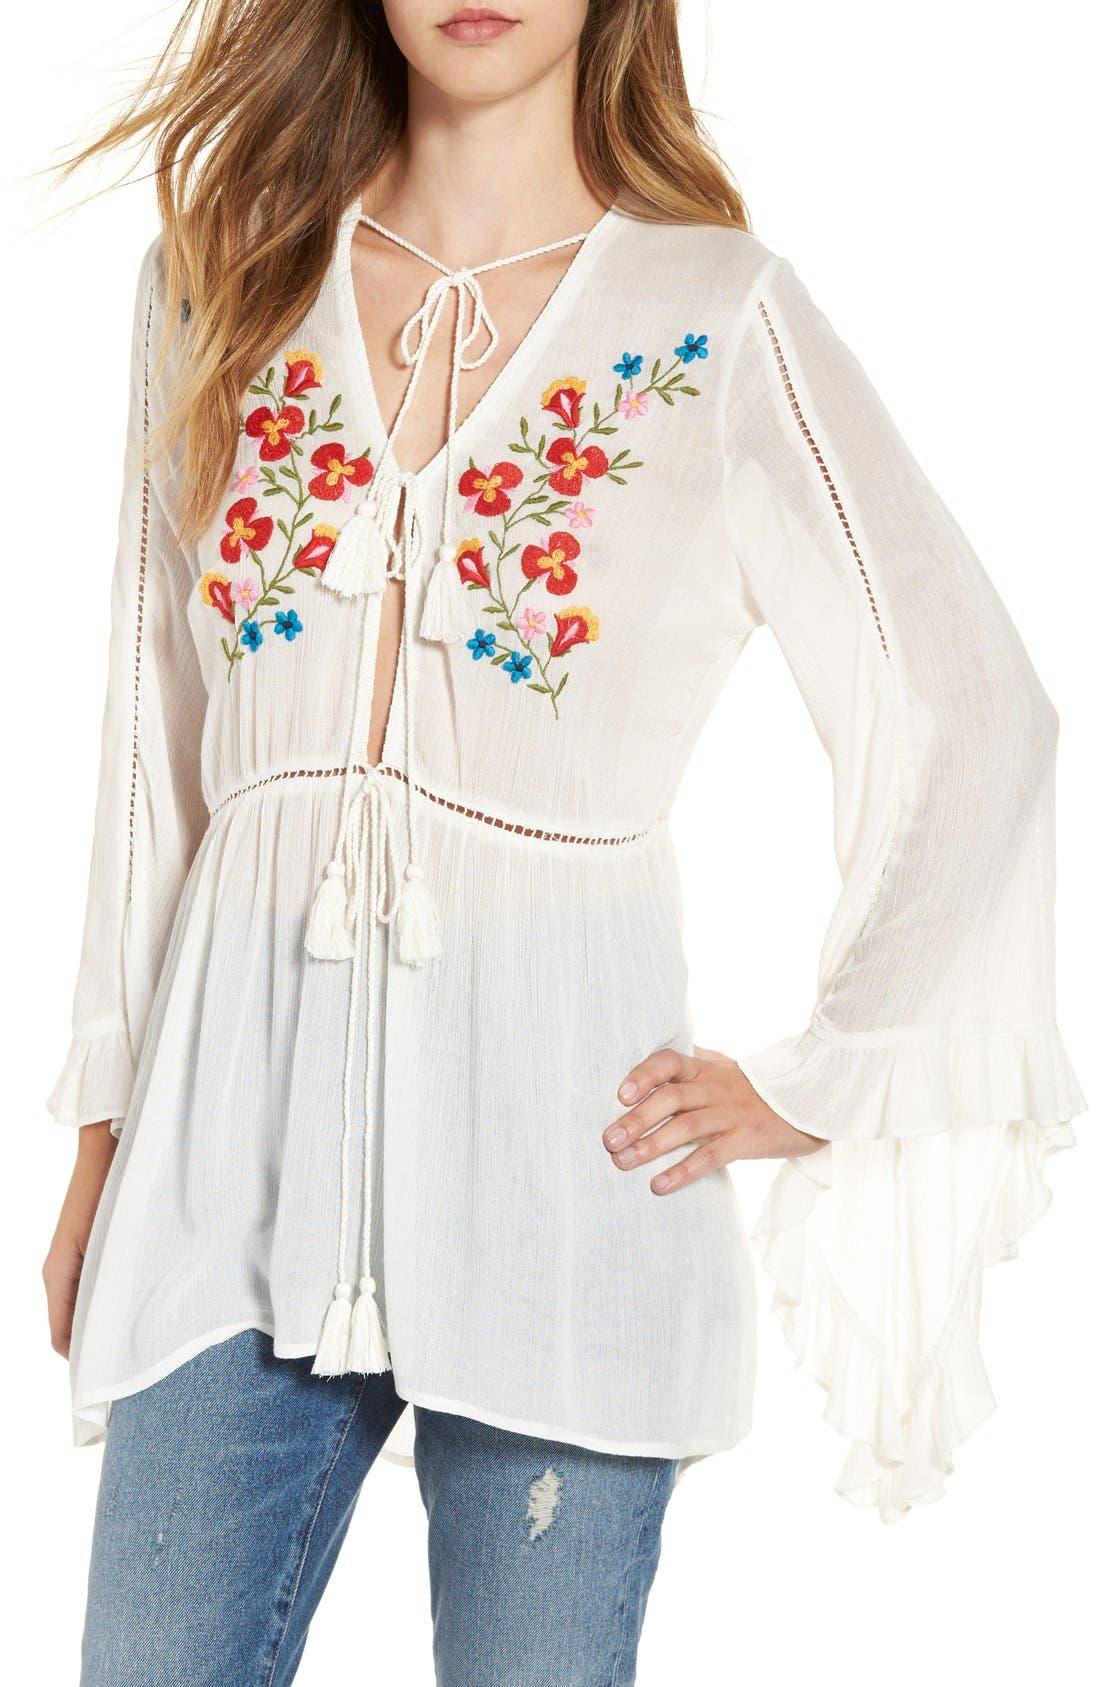 Alternate Image 1 Selected - Glamorous Embroidered Long Sleeve Tunic